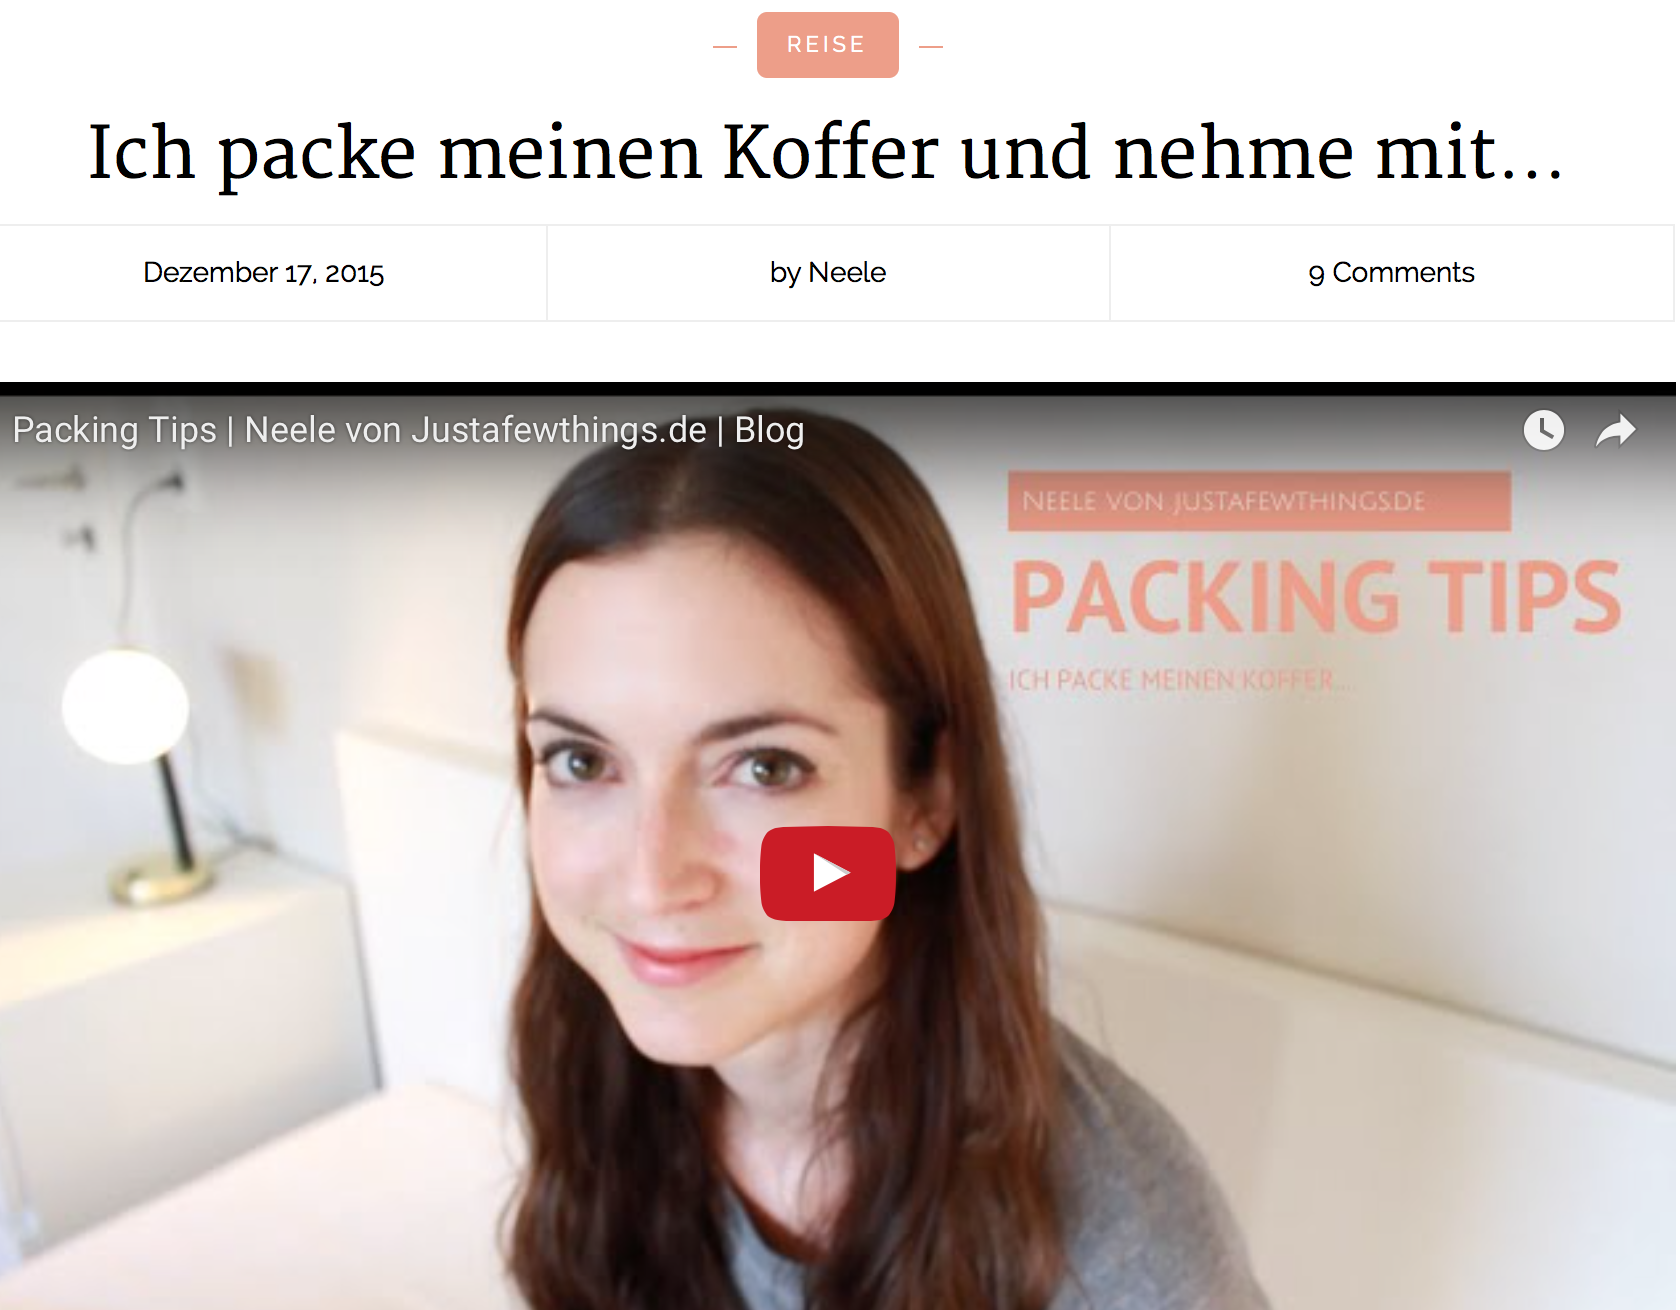 Jahresrückblick 2015 just a few things Ich packe meinen Koffer